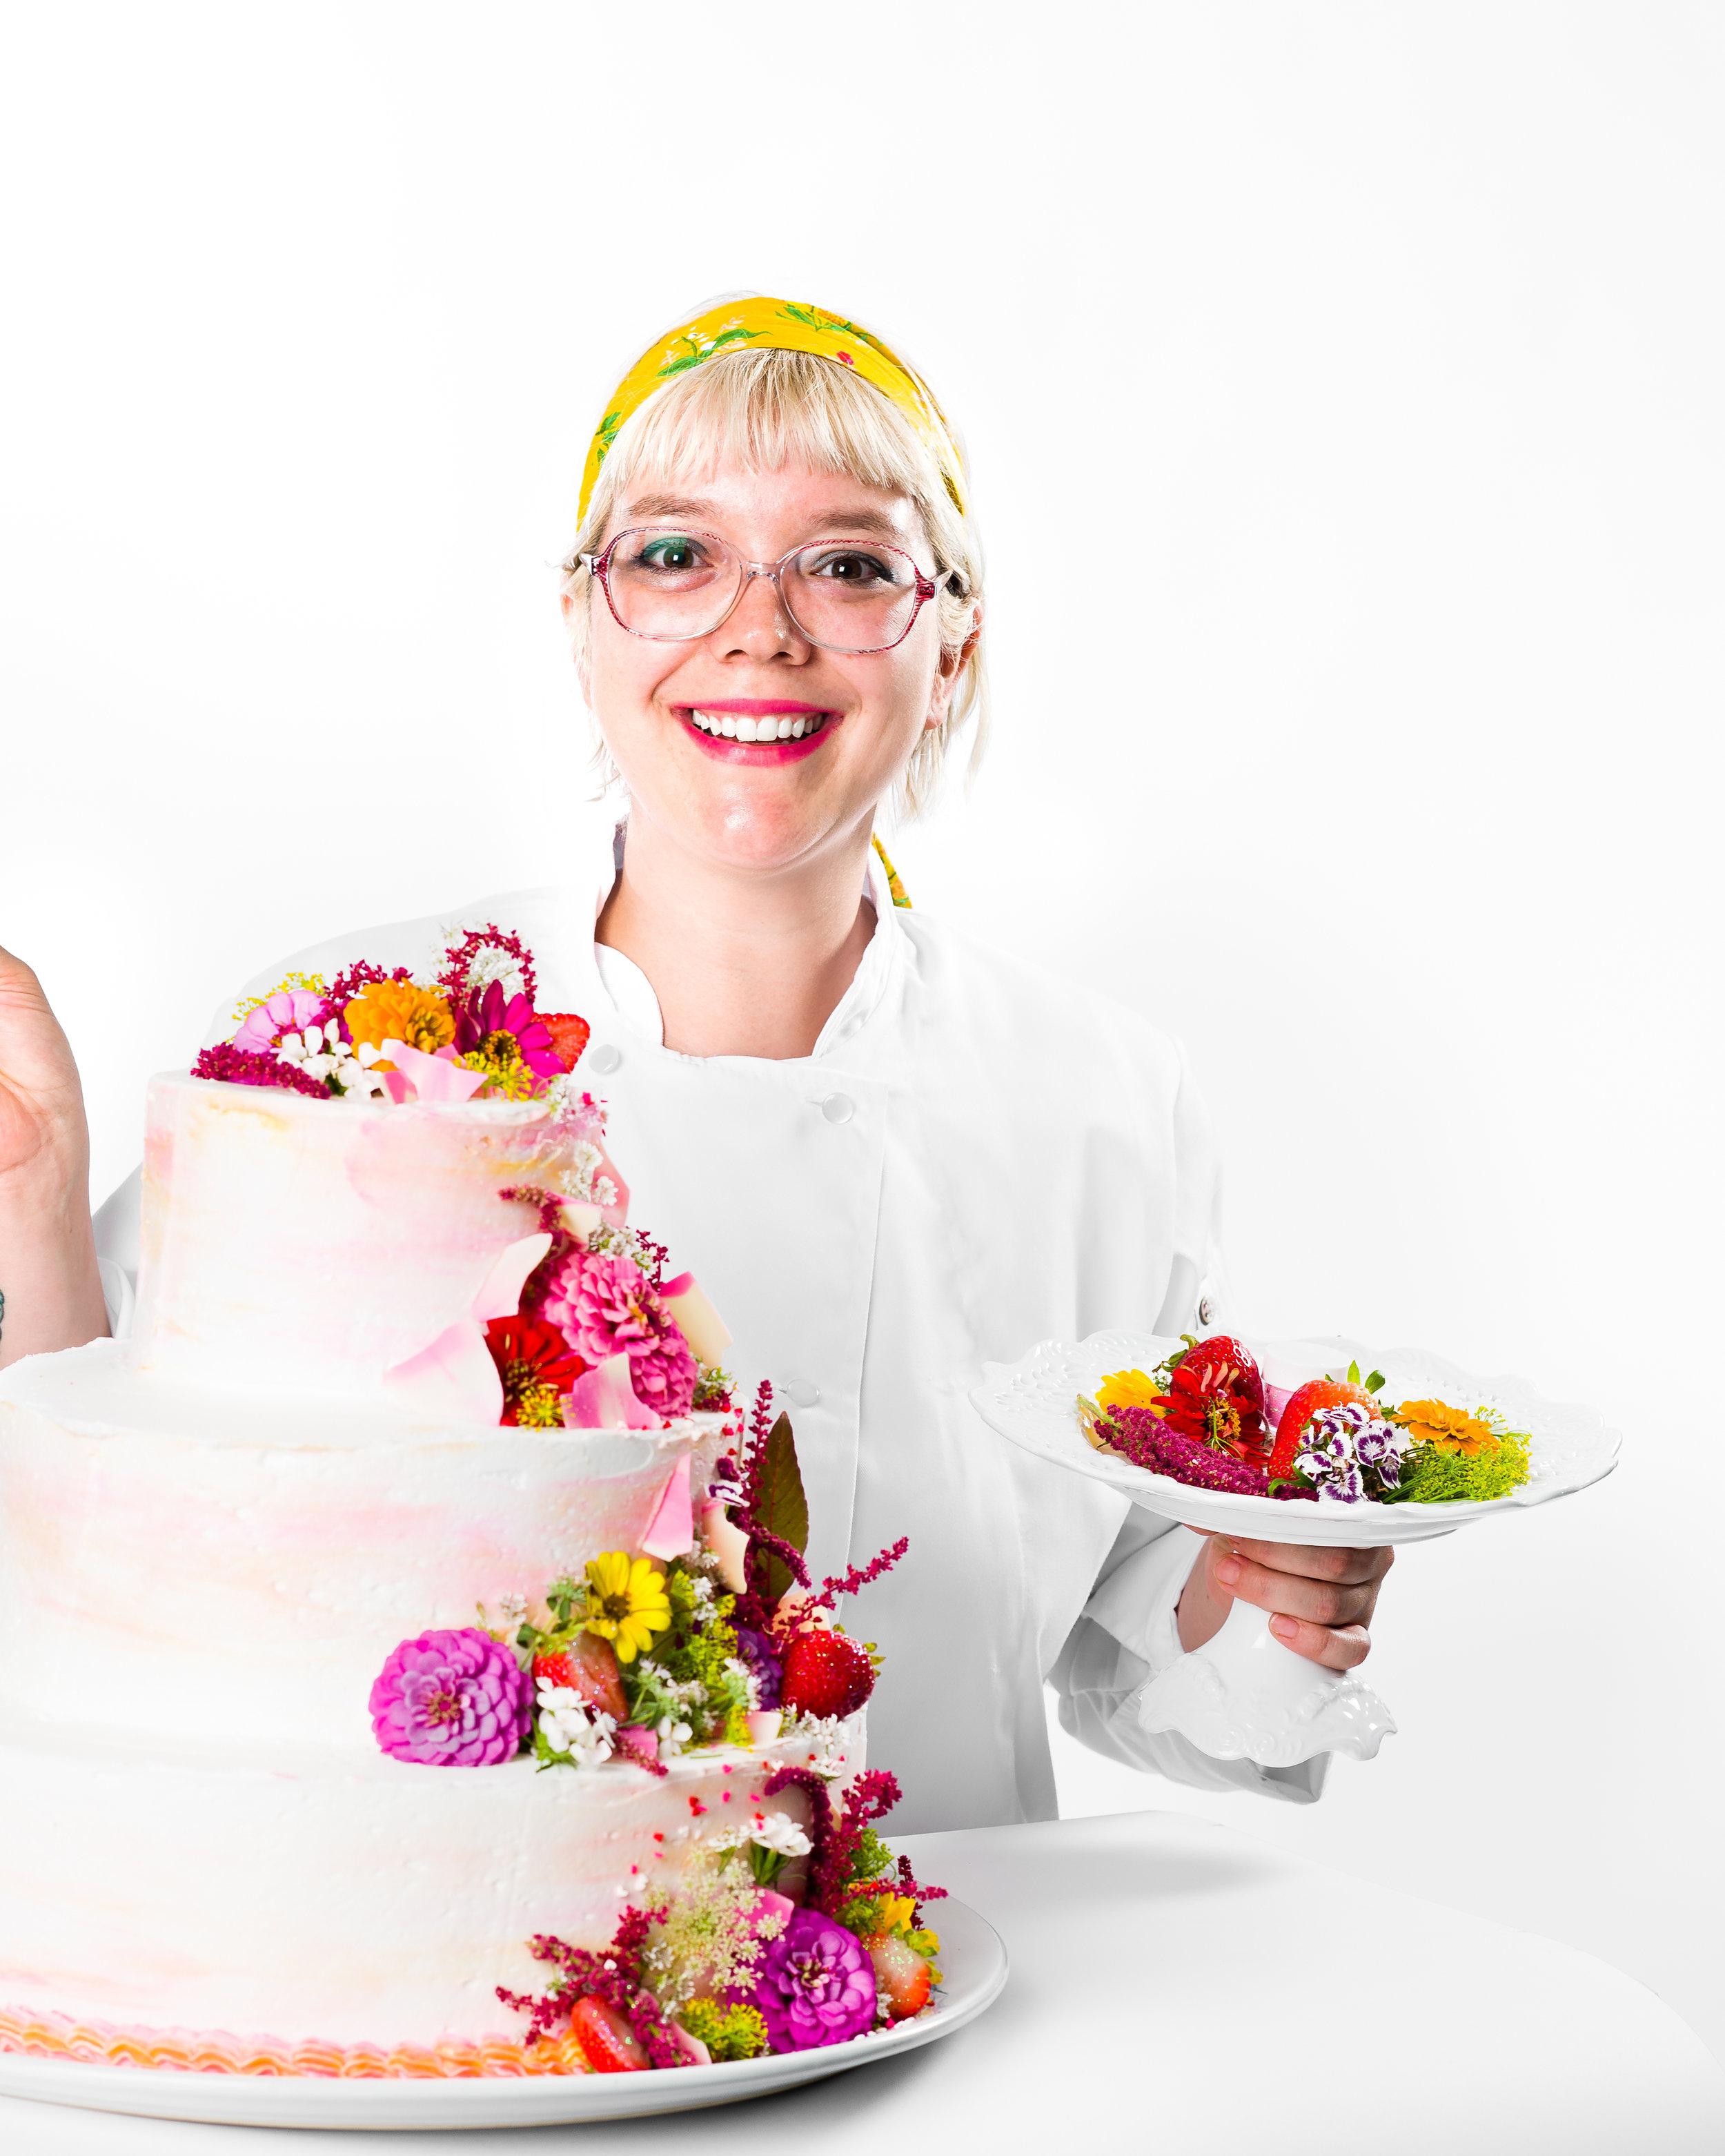 cake decorating 2.jpg